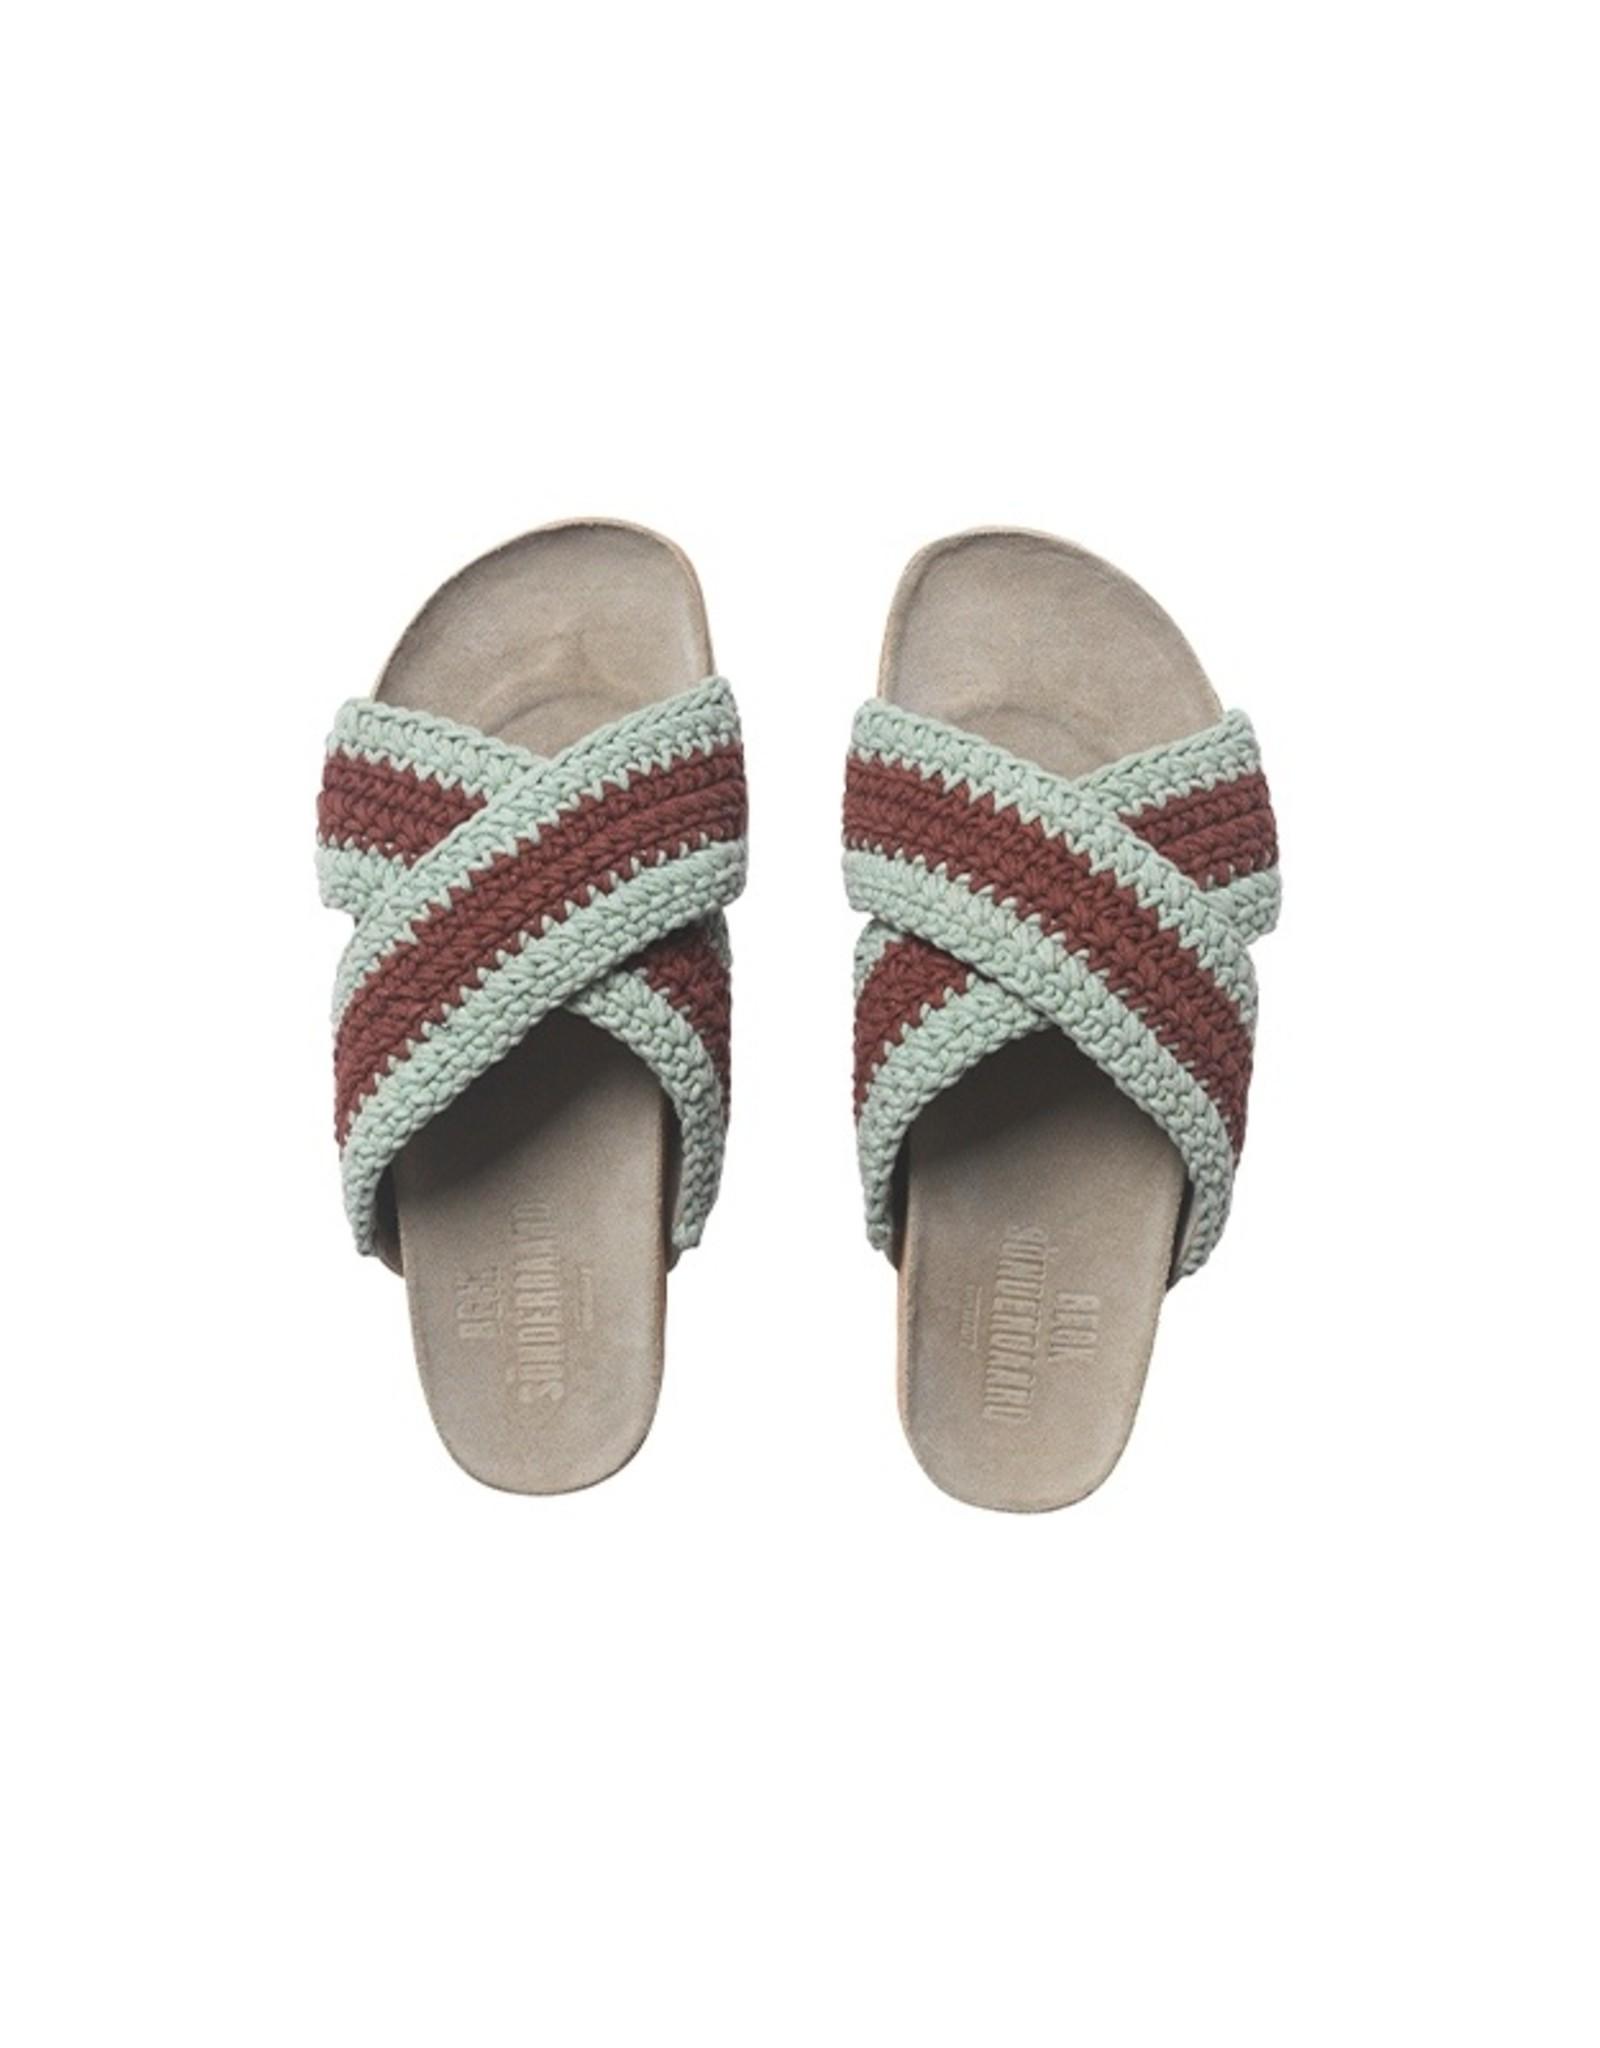 Becksöndergaard Slippers 'Yvonne Crochet' - Sand - Becksöndergaard